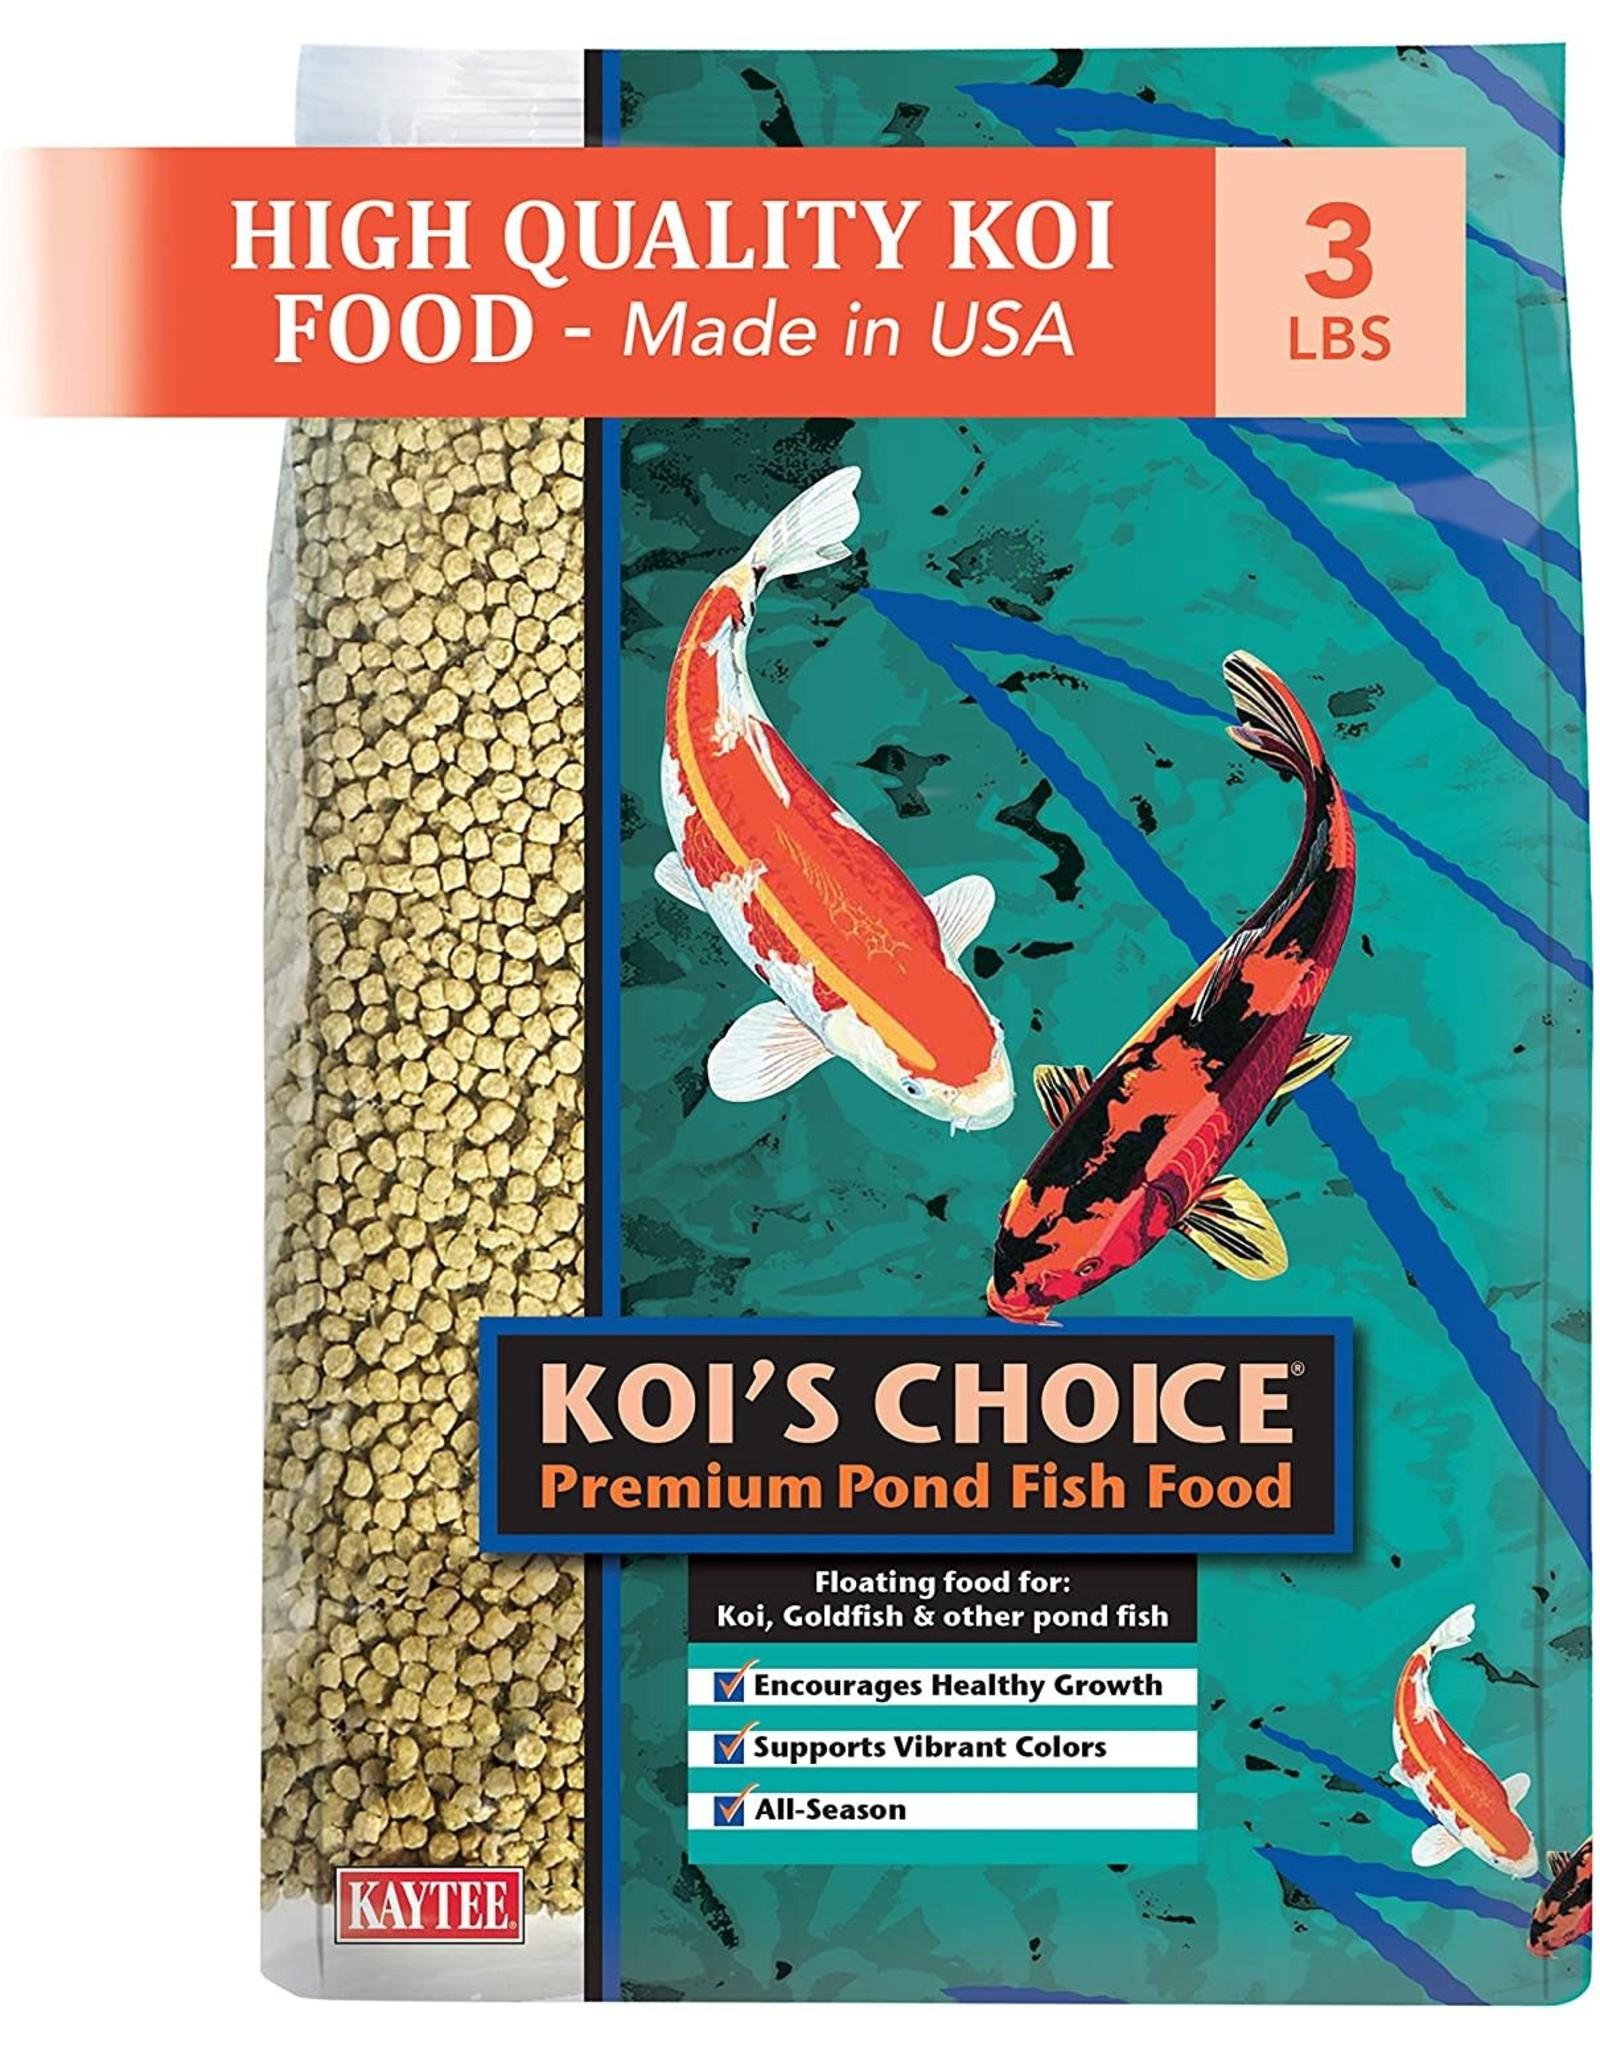 Kaytee KAYTEE KOI'S CHOICE PREMIUM POND FISH FOOD 3LB